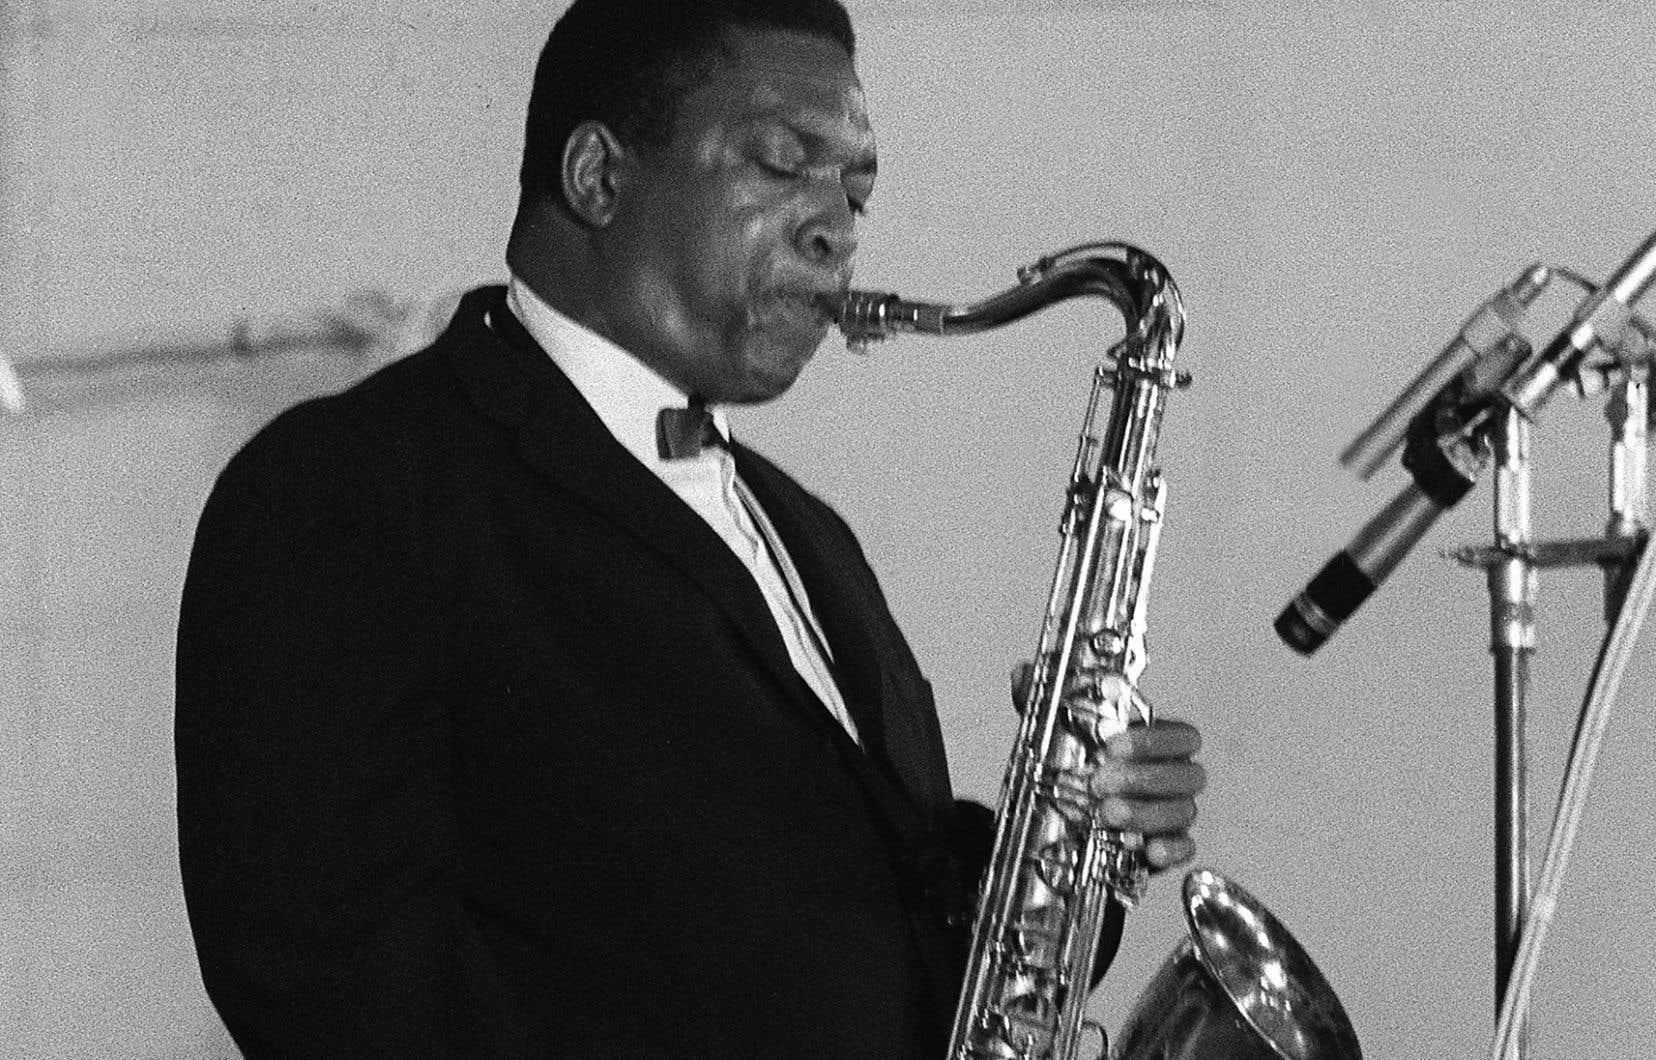 Le saxophoniste John Coltrane